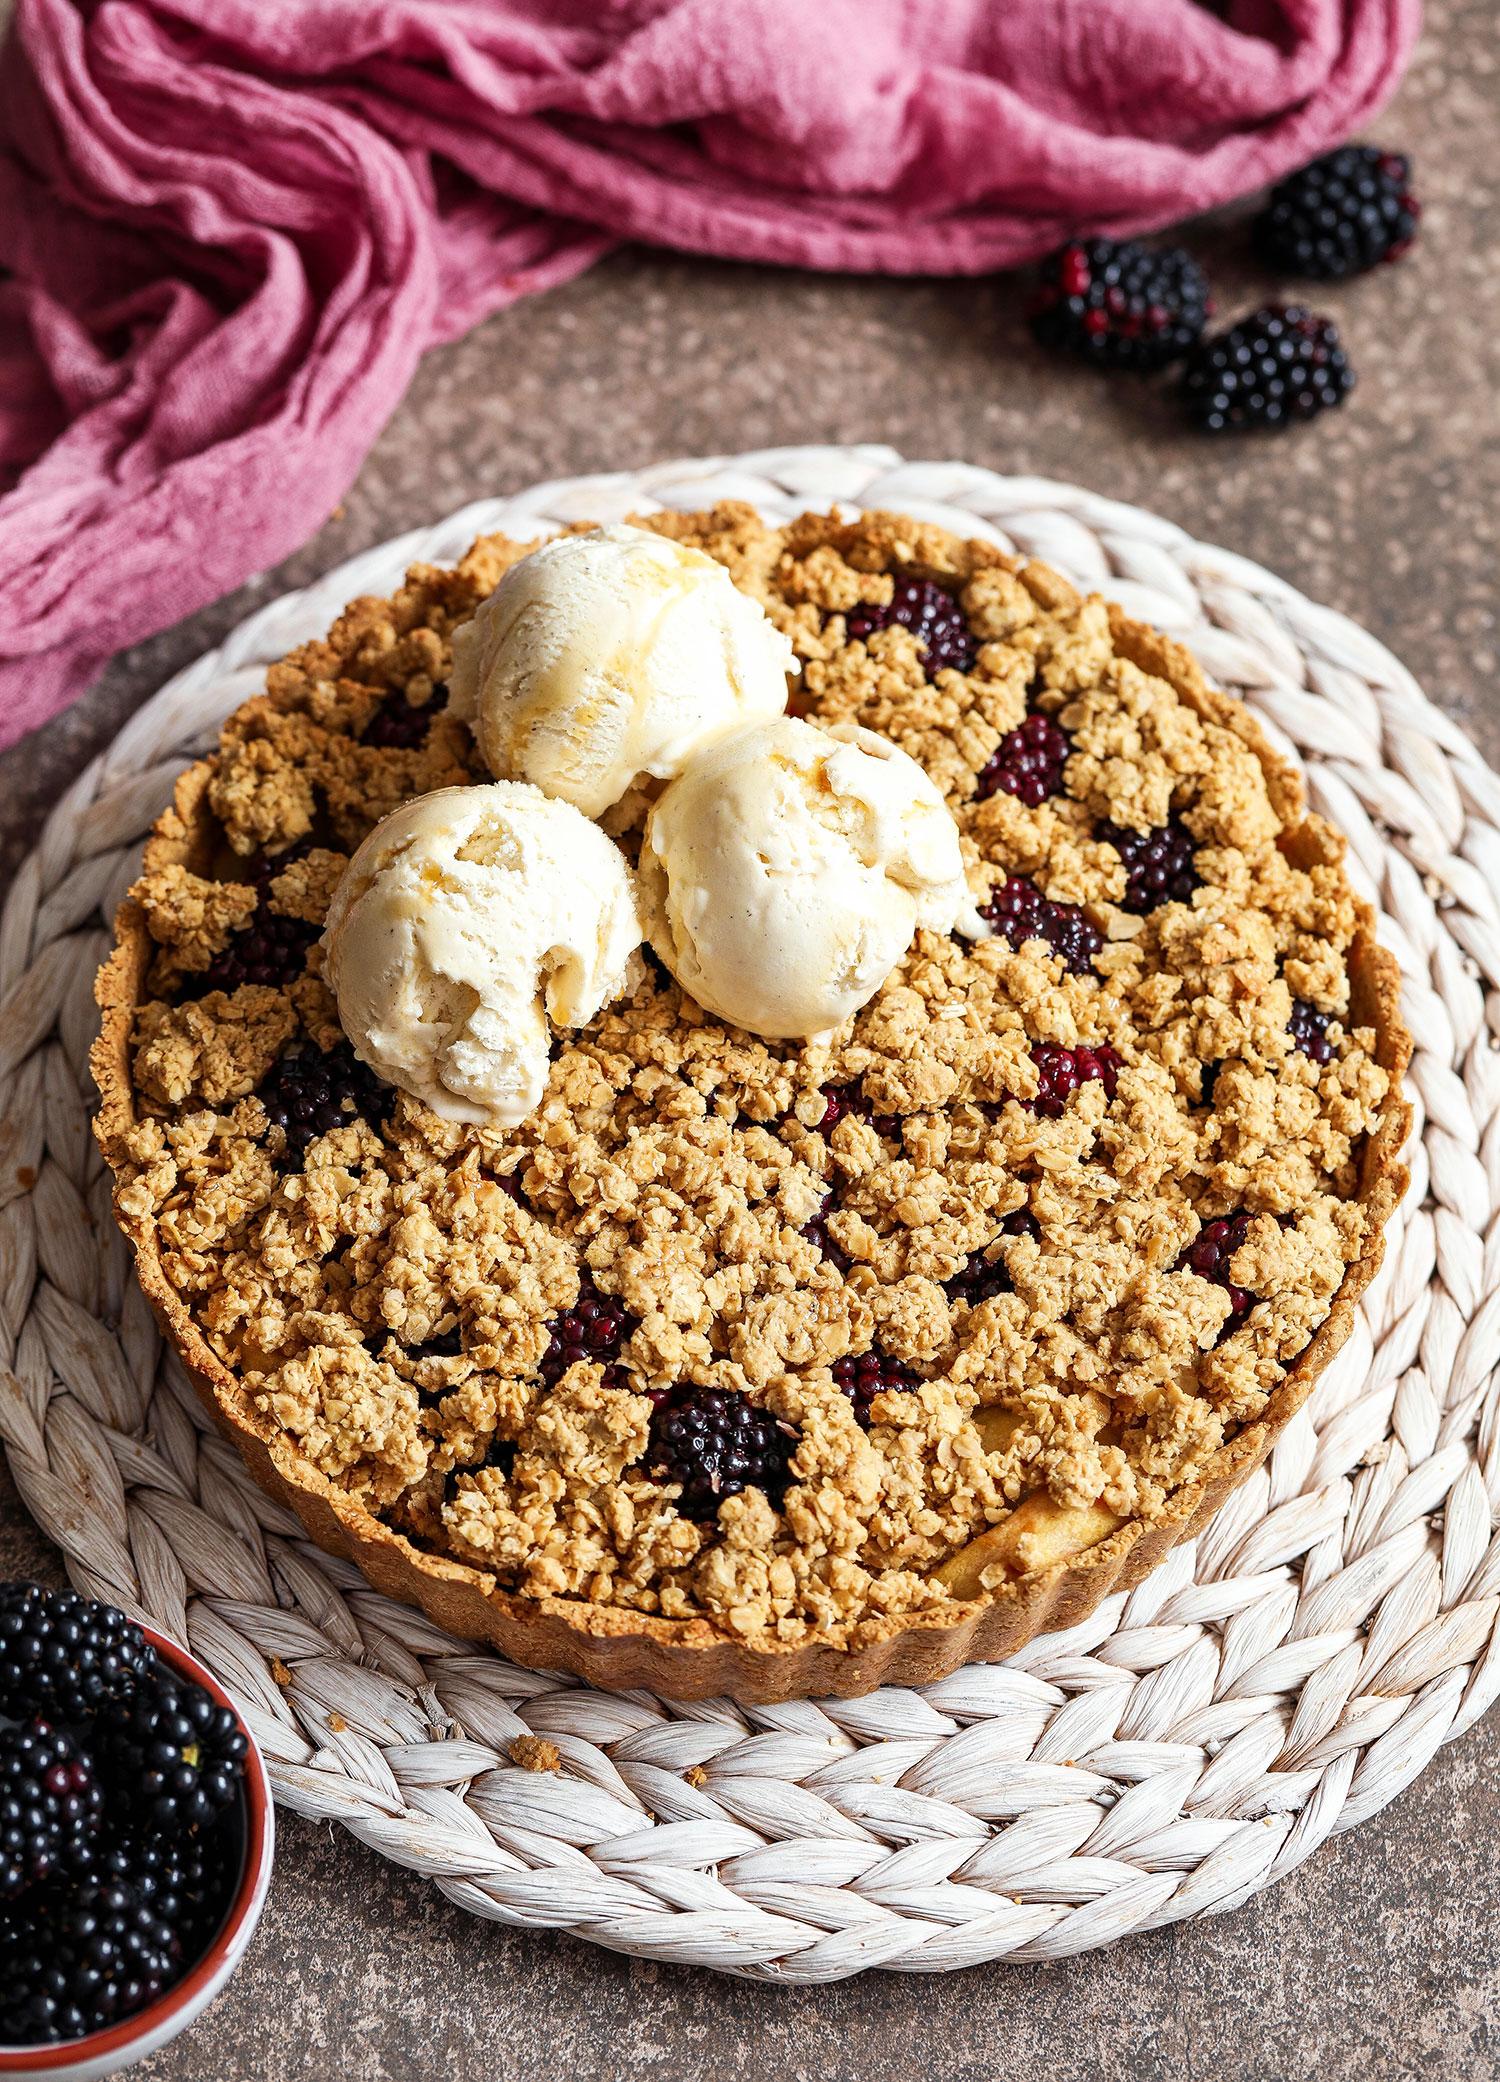 Apple Blackberry Crumble Tart (Vegan & Gluten-free)